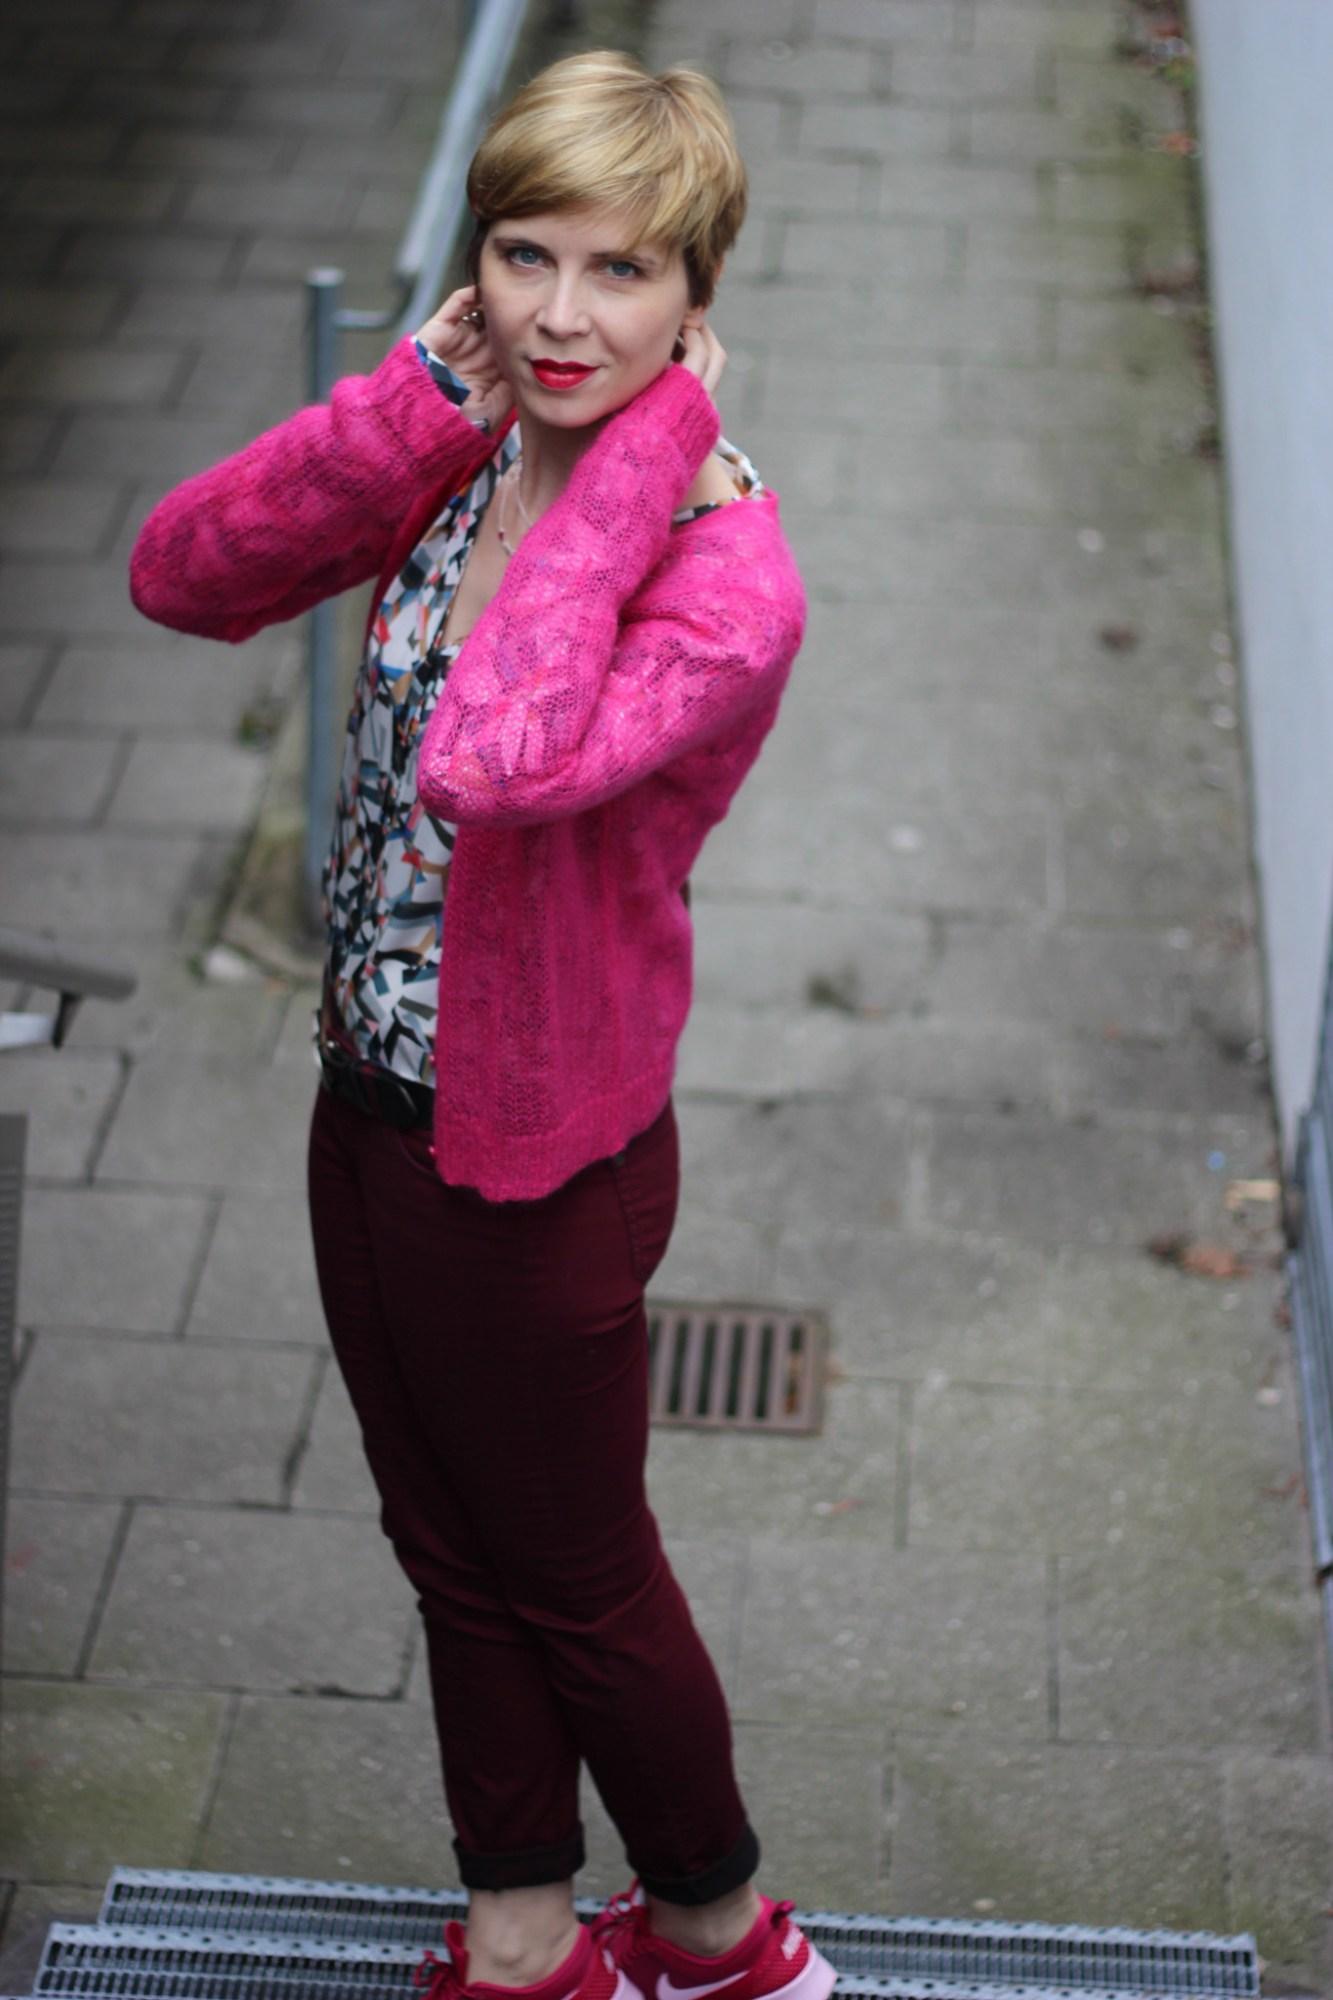 IMG_8100-pink-red-connydolllifestyle-bloggerprojekt-ann-fab40s